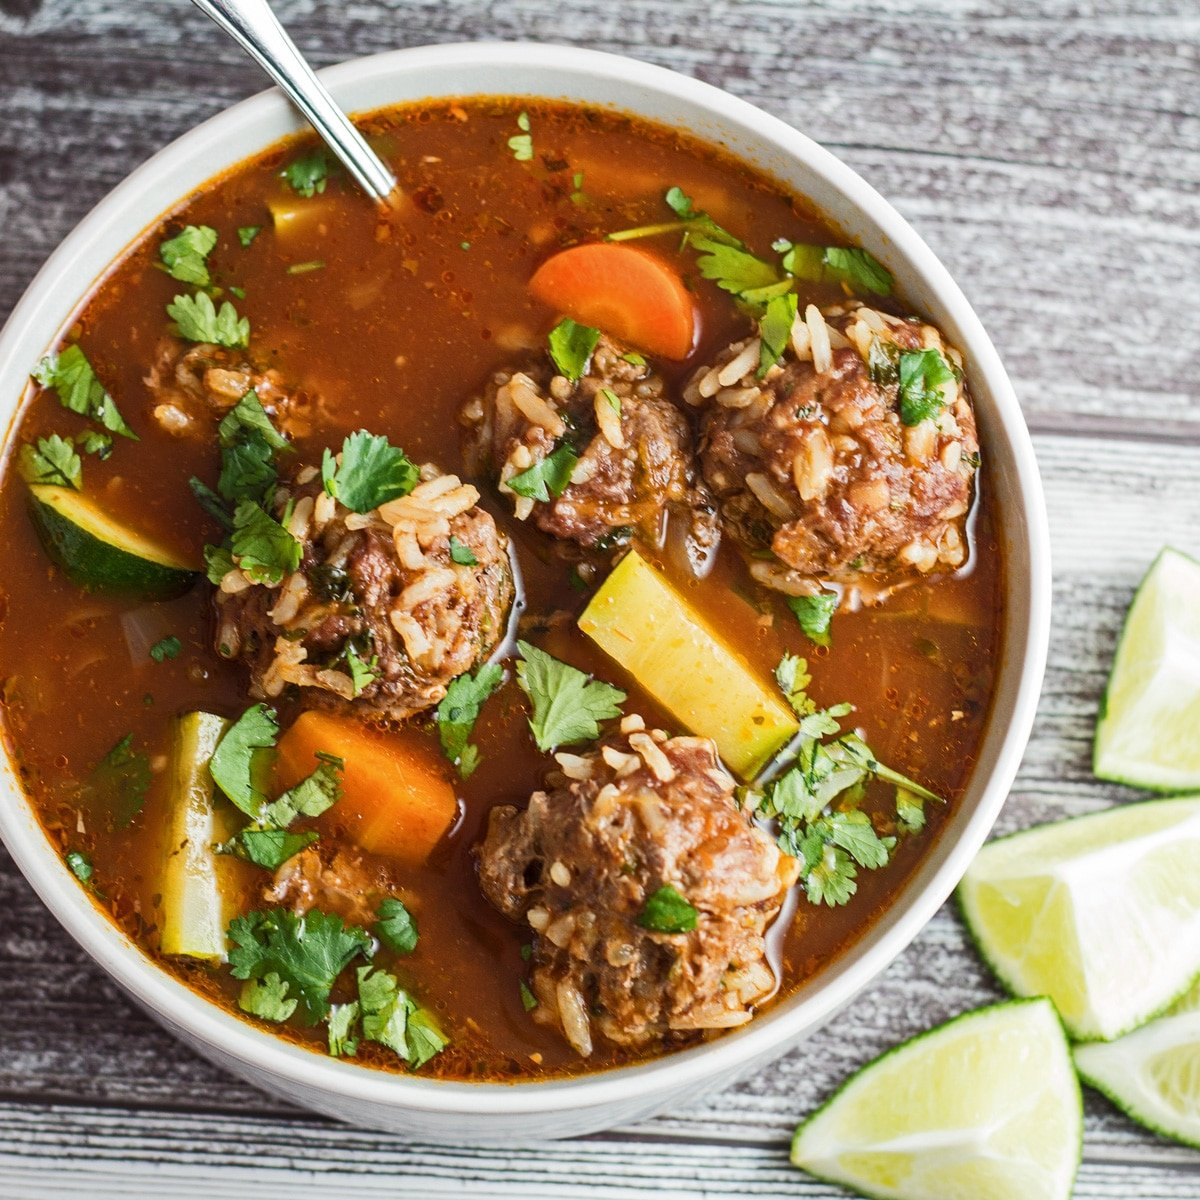 Albondigas soup with carrot, onion, potato, and zucchini.